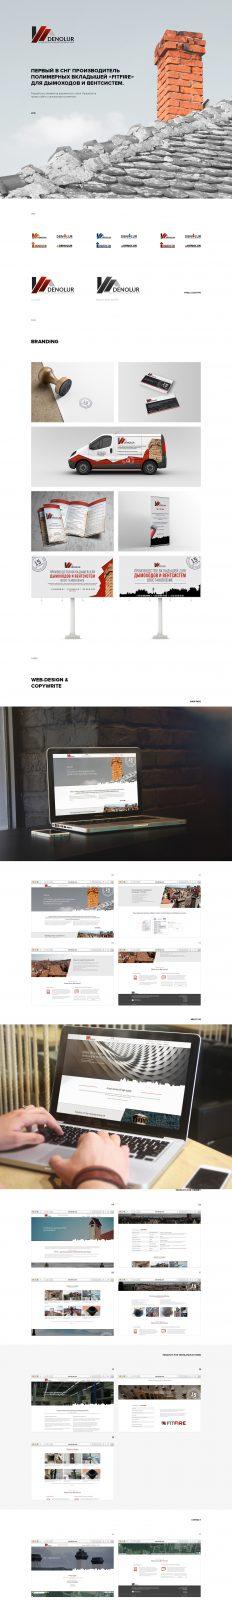 денолюр страница сайта